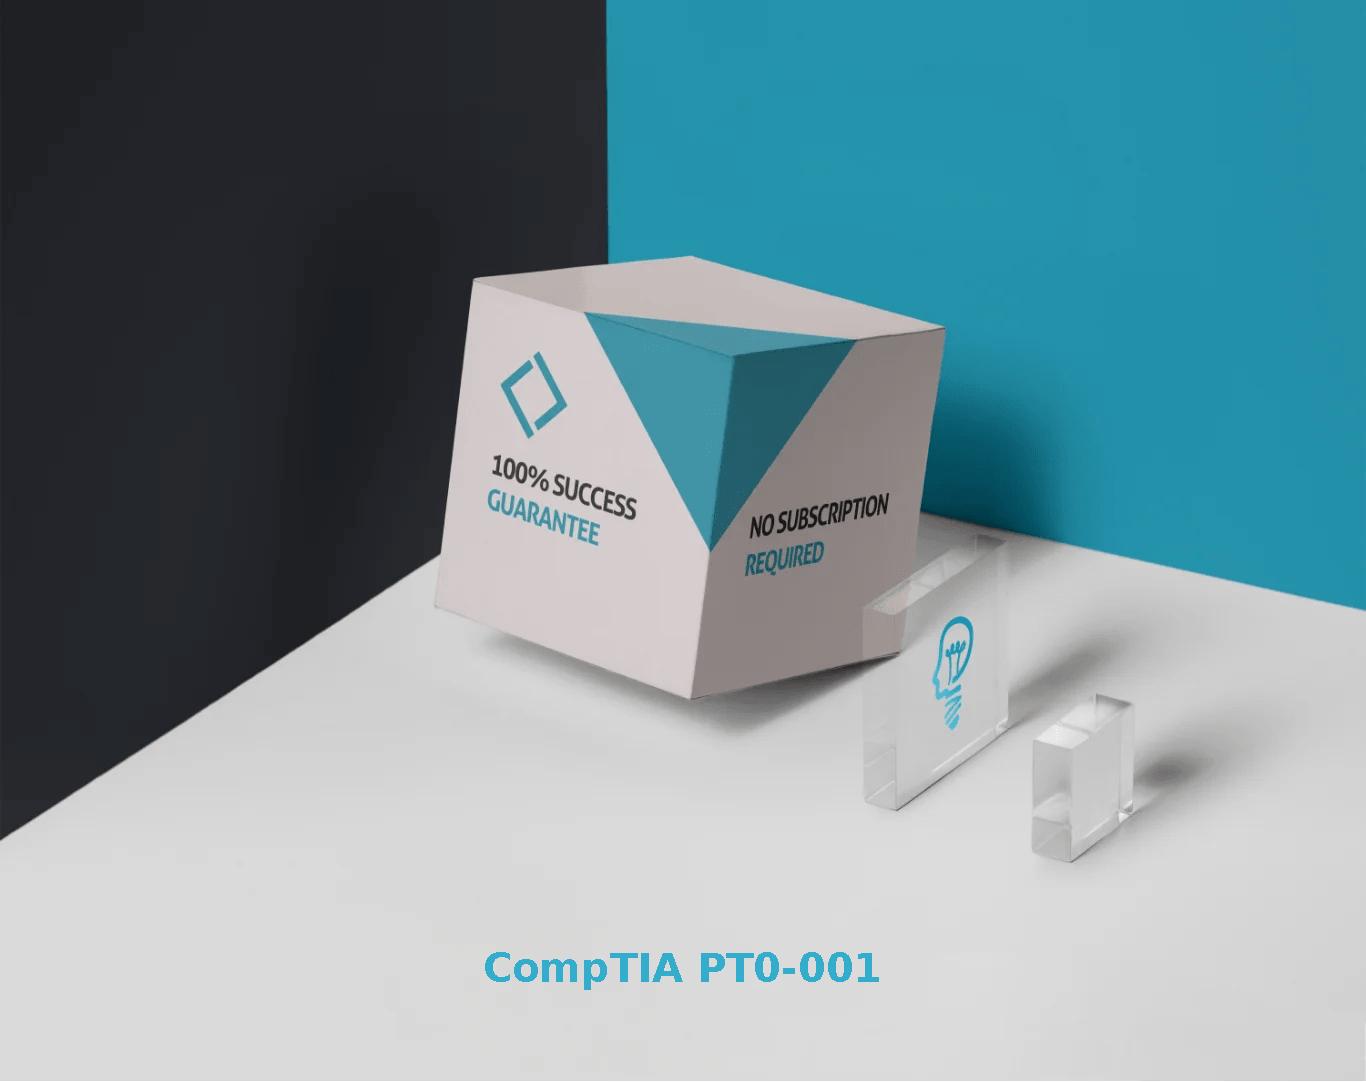 CompTIA PT0-001 Exams